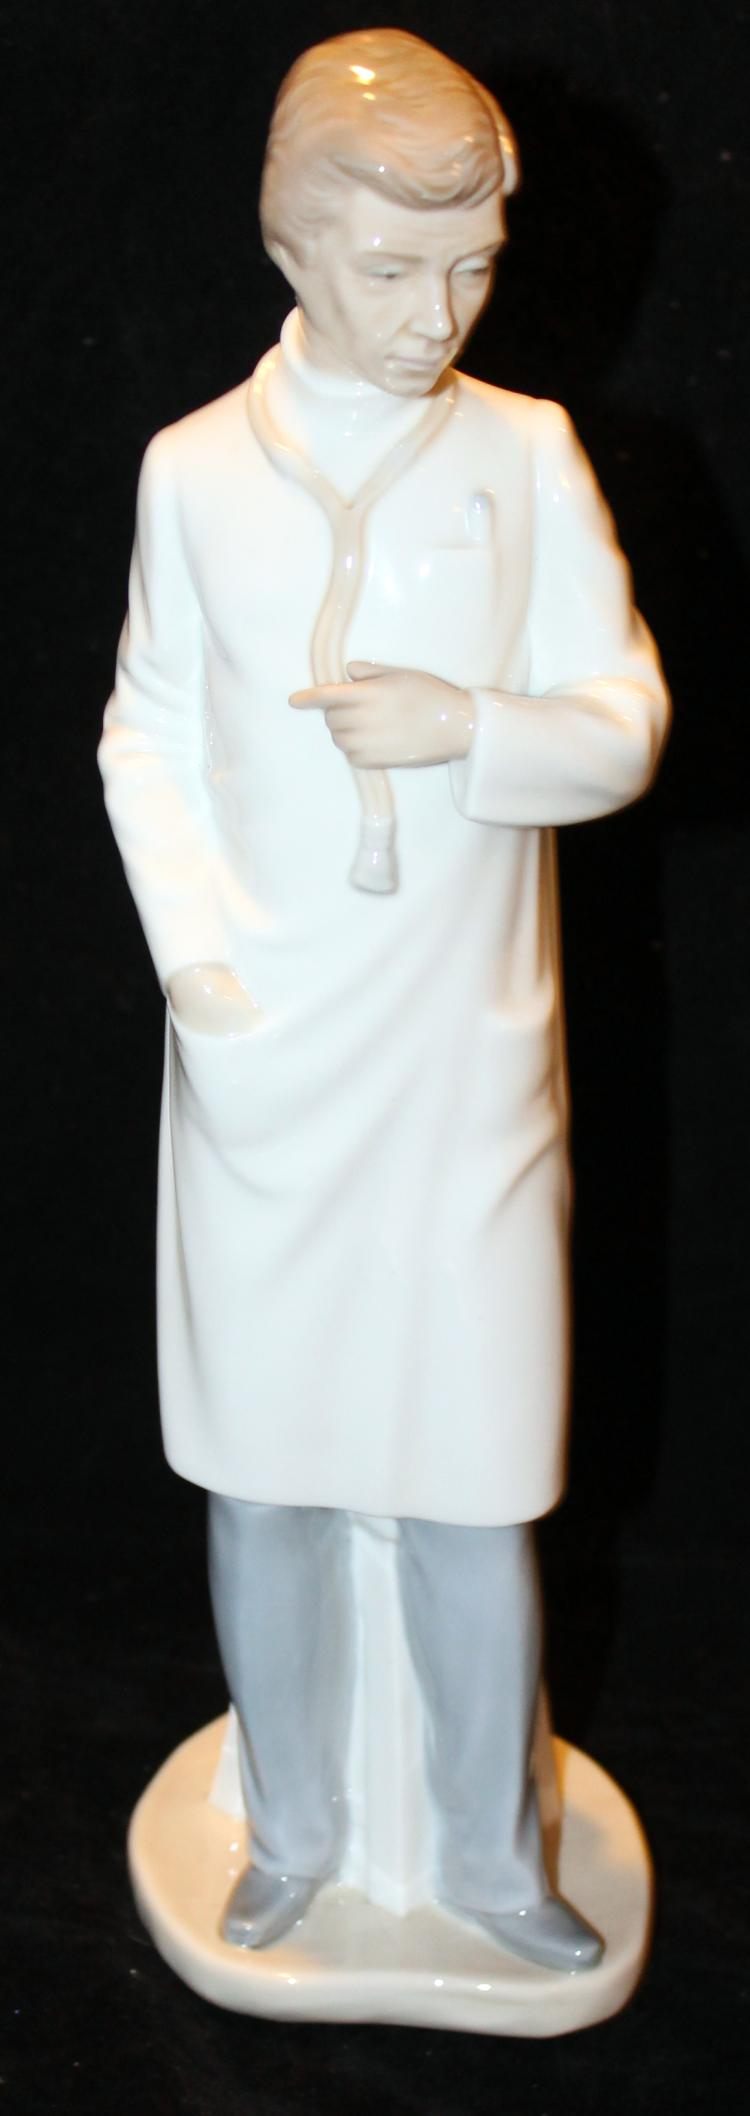 Porcelain Nao Spanish Doctor Figurine